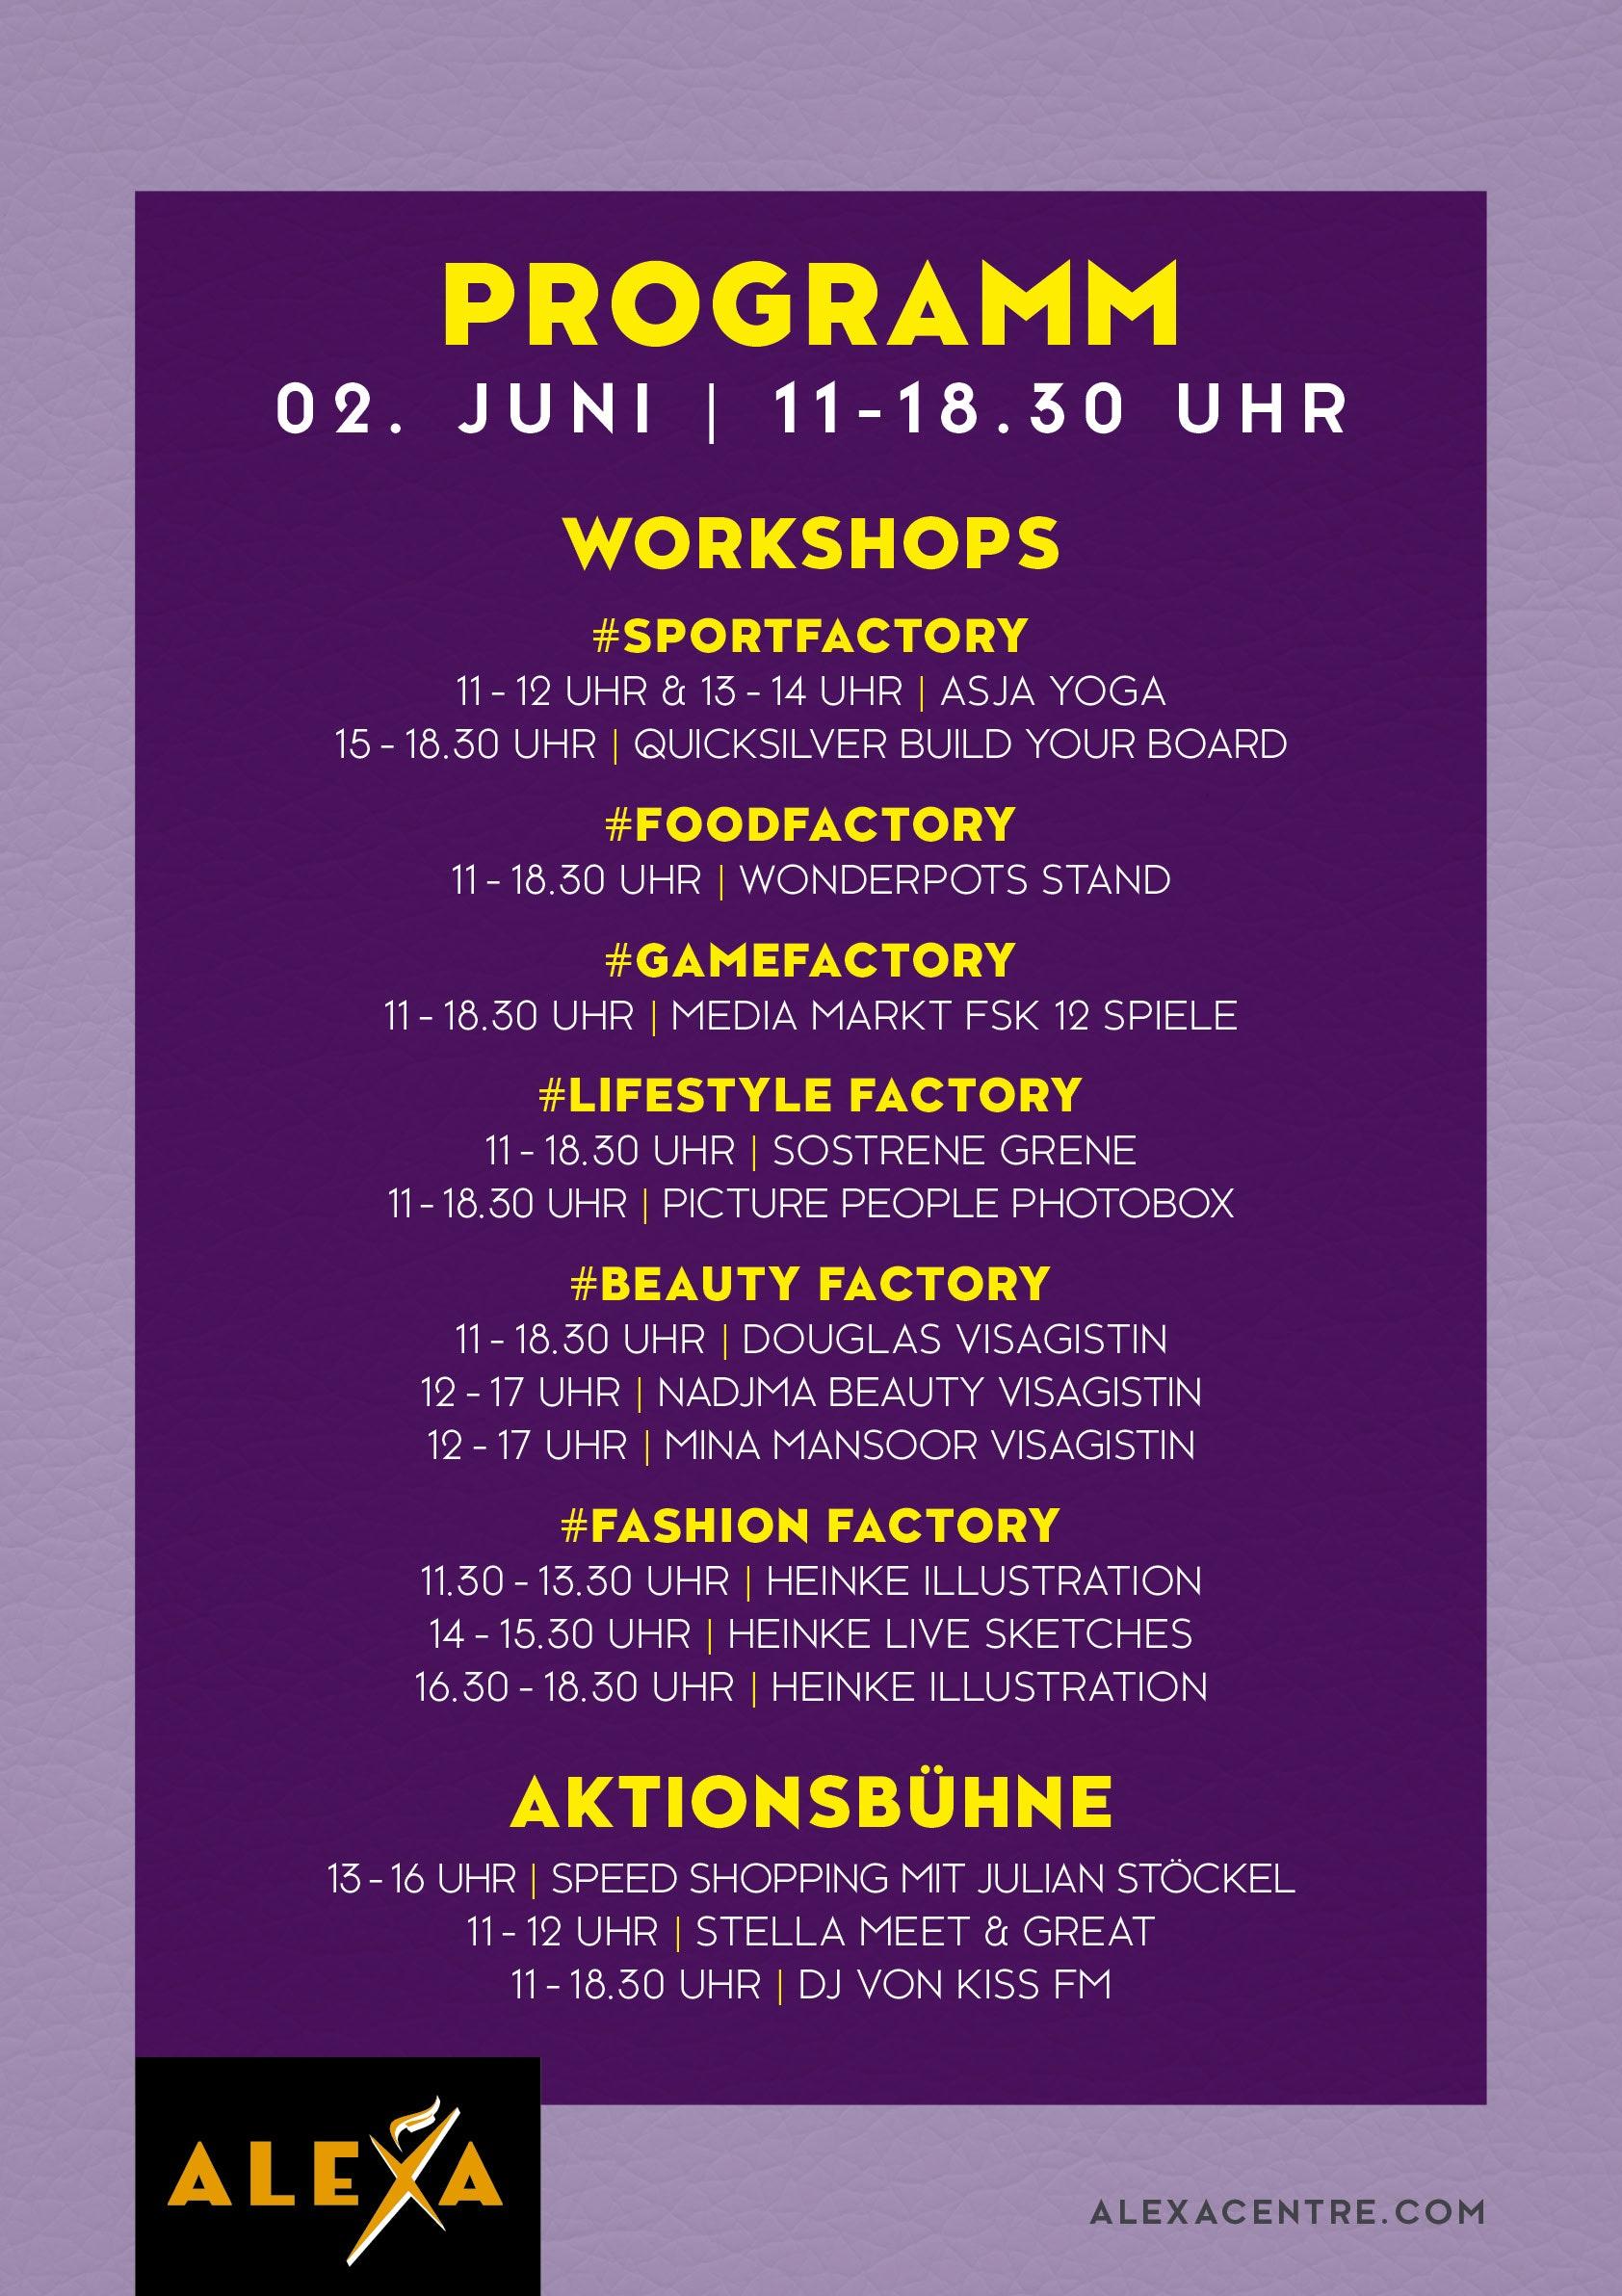 ALE-180056 Social Media Day A1 Plakat Programm2